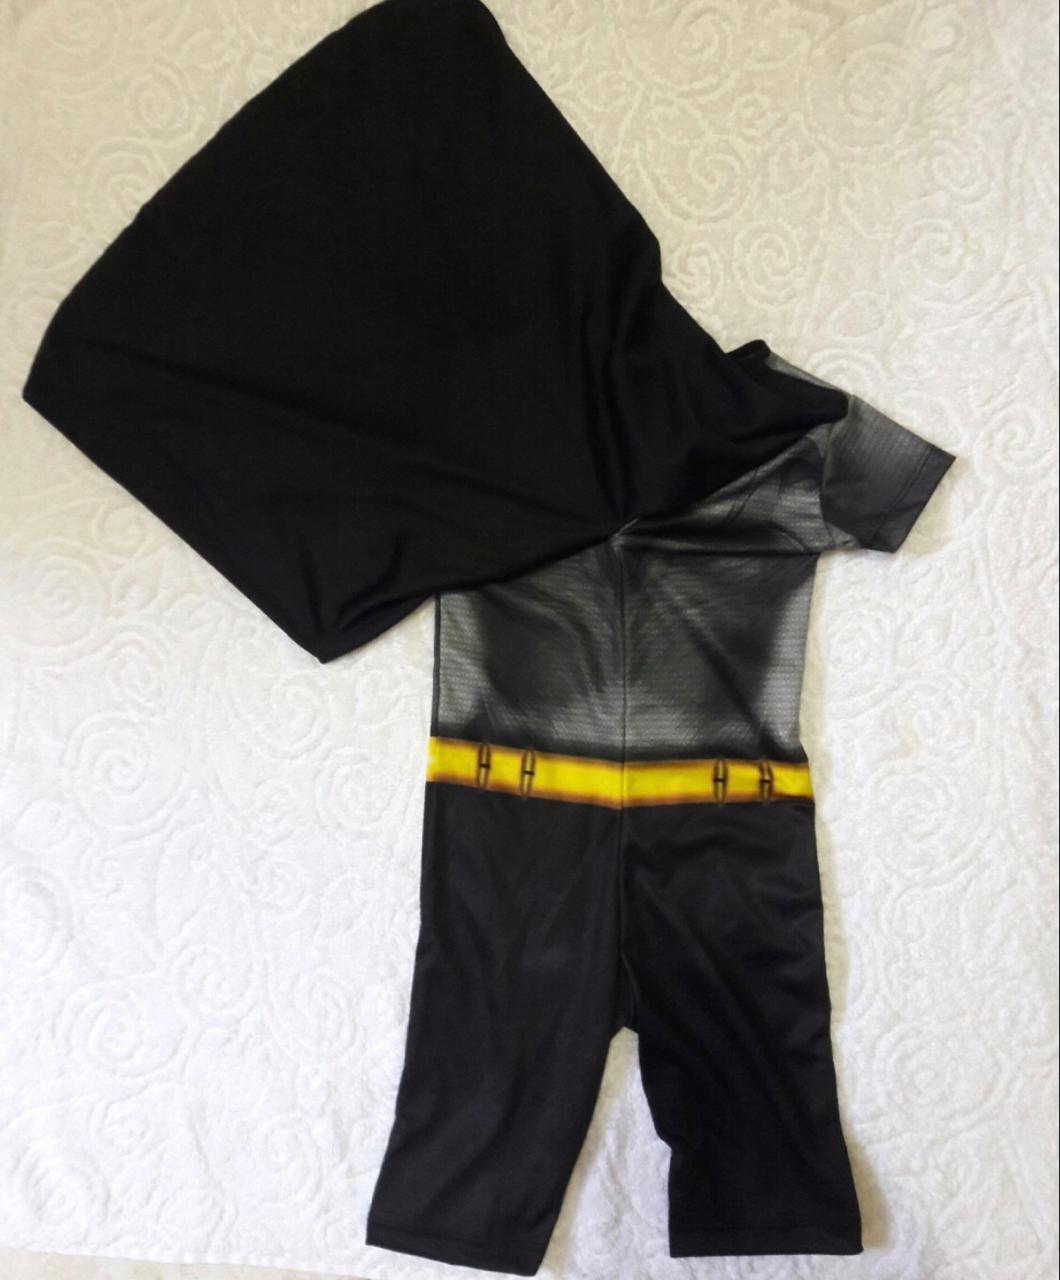 Fantasia Batman com Máscara